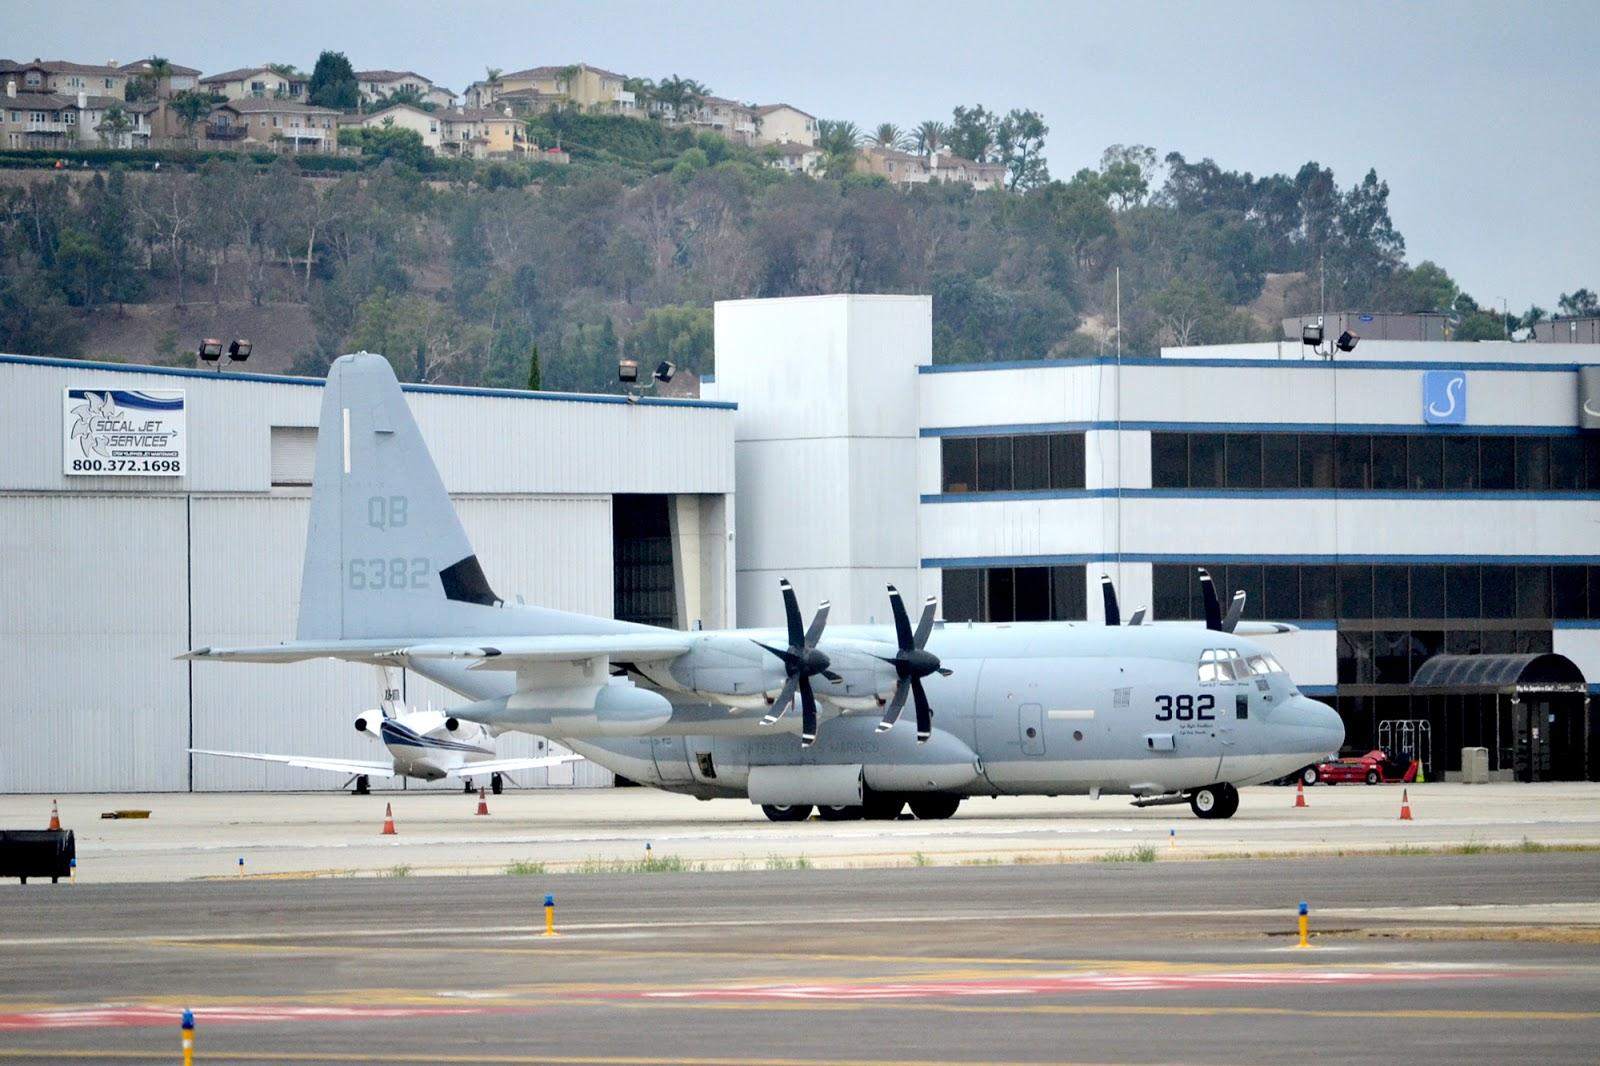 Long Beach Airport Noise Abatement